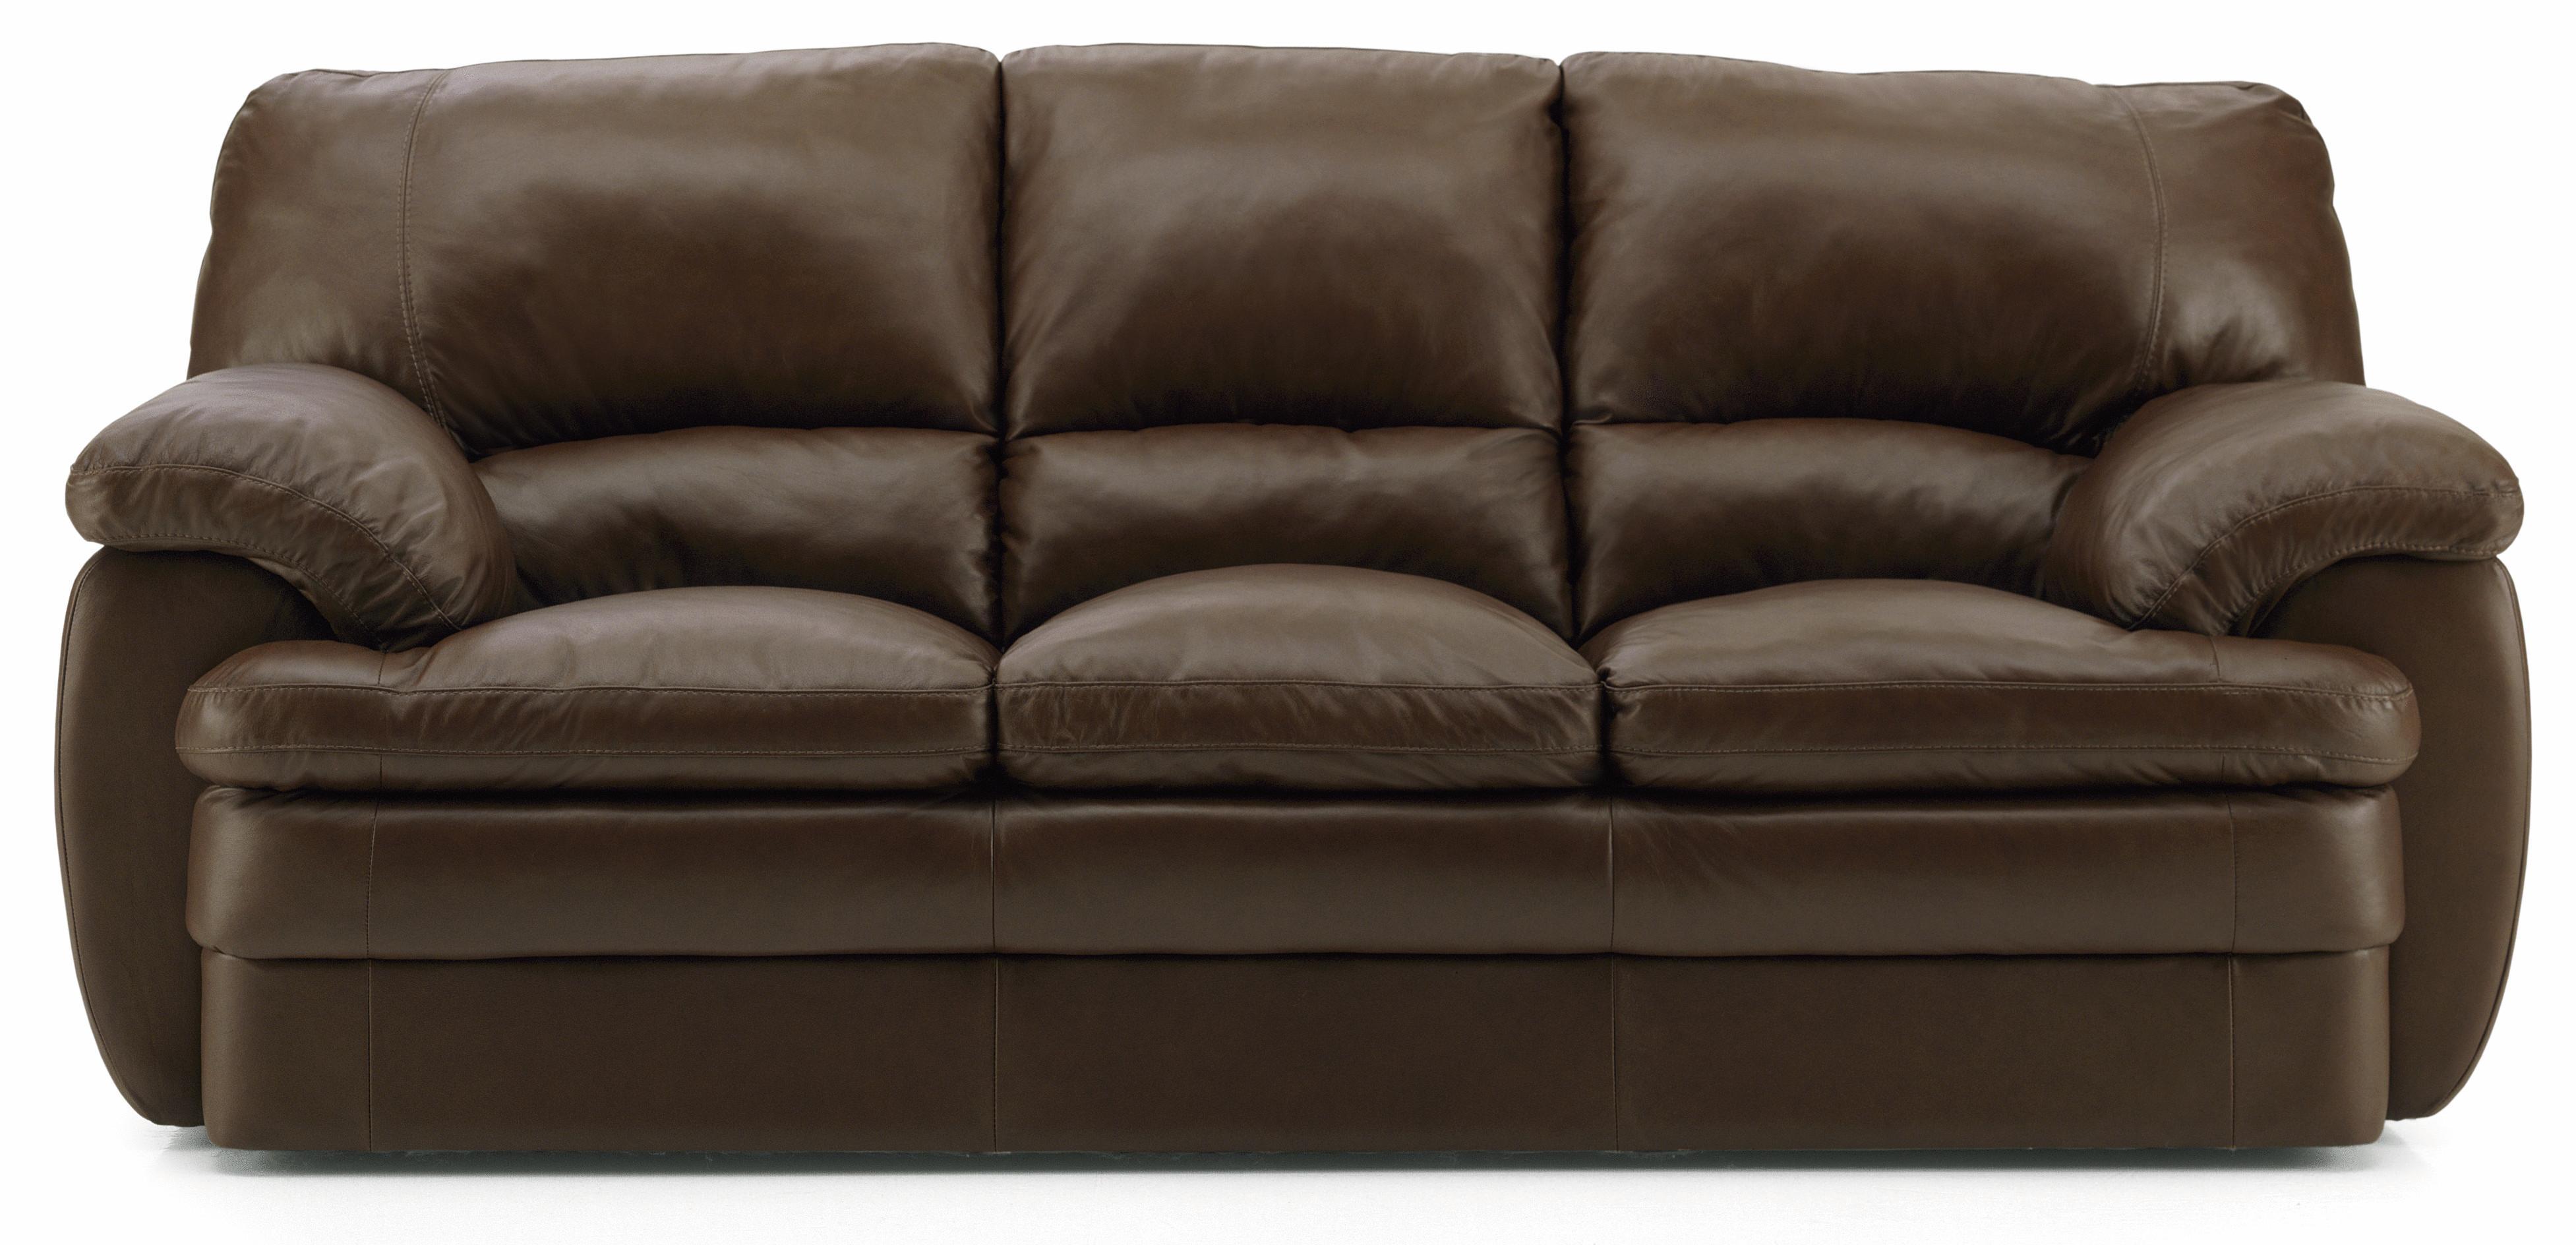 Palliser marcella pillow top sofa olinde 39 s furniture sofa for Sofa 99 euro